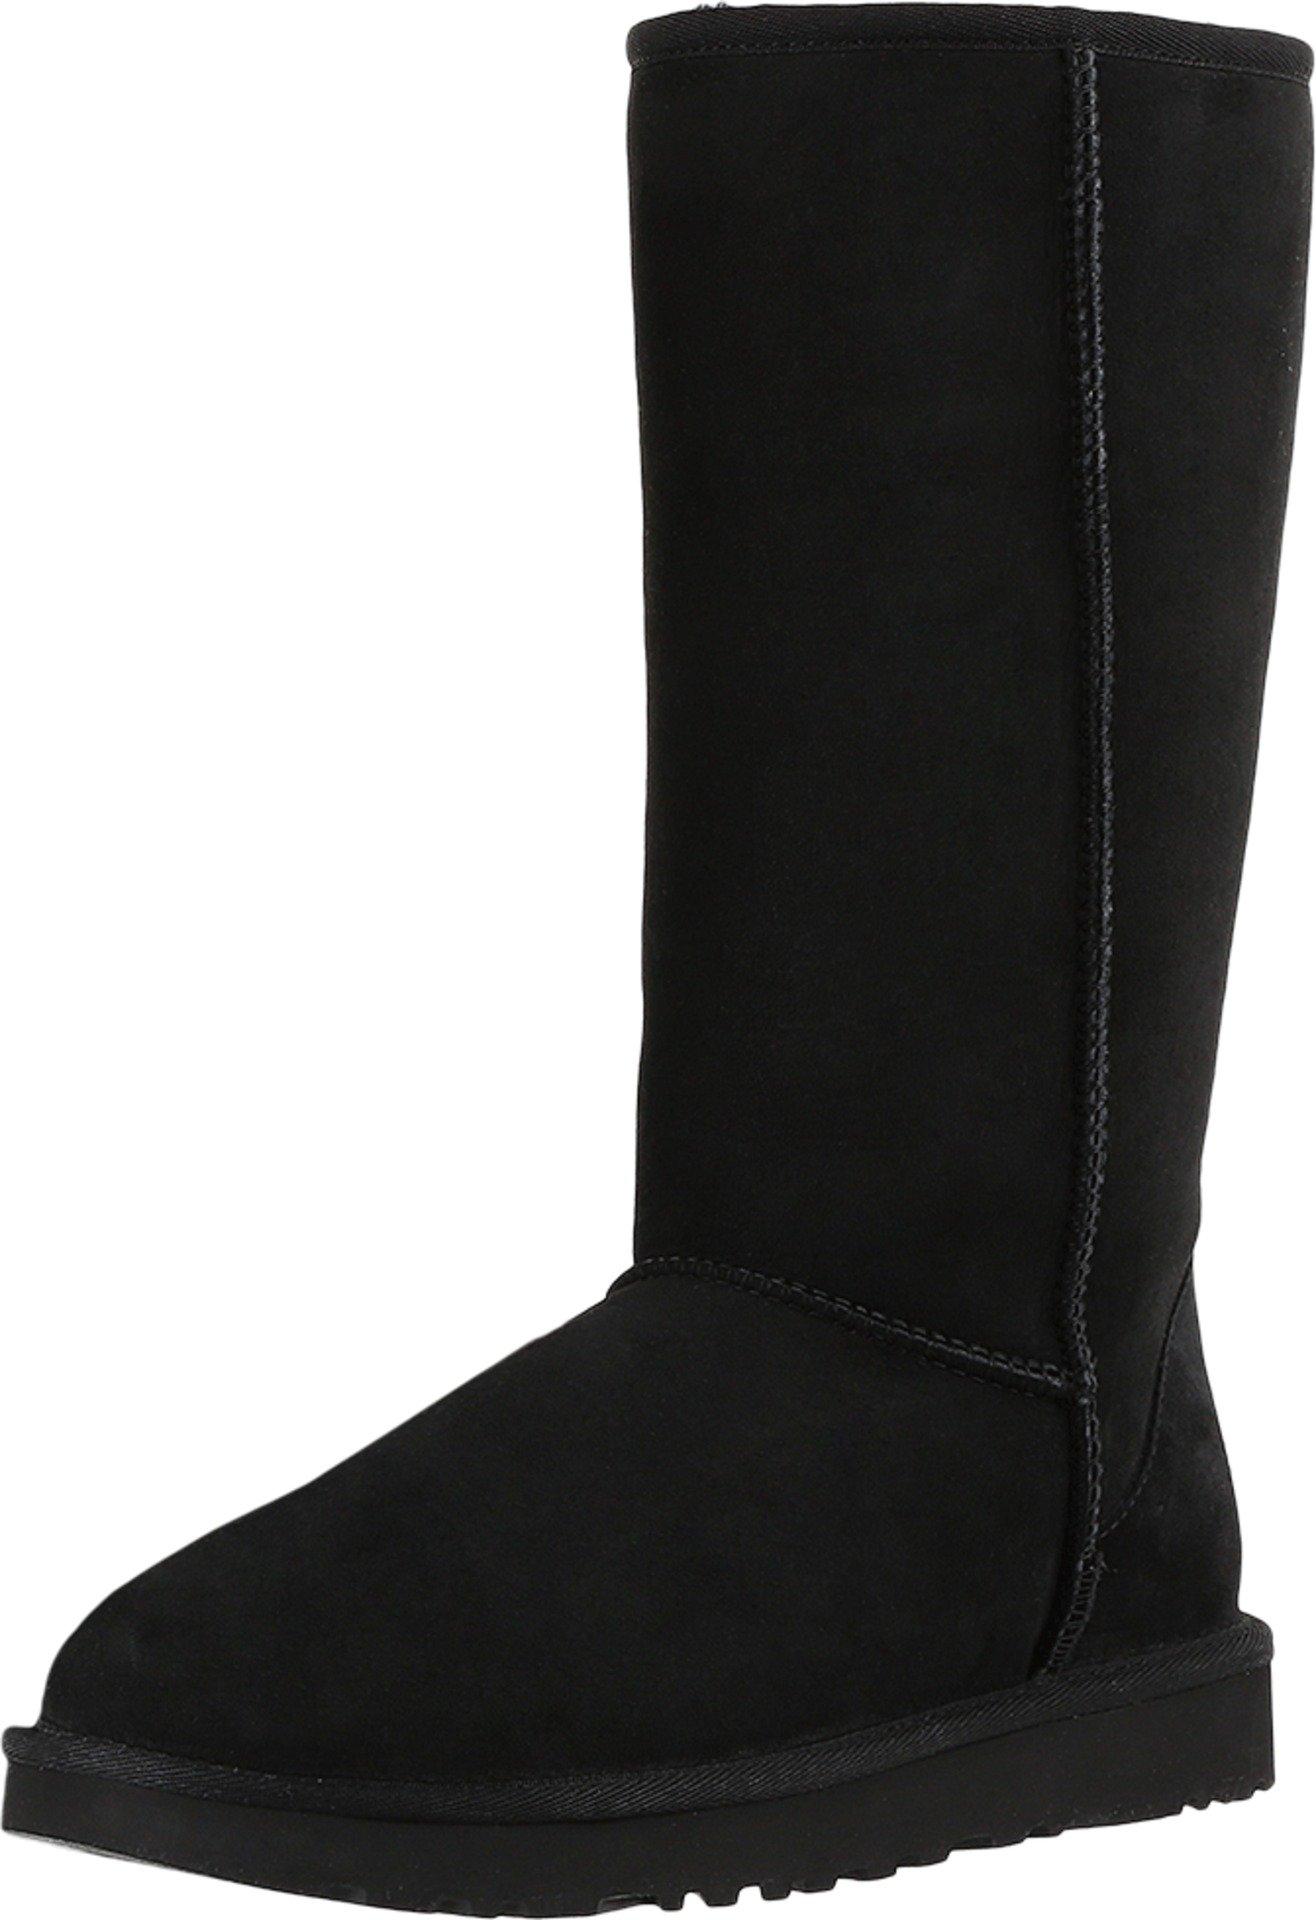 UGG Women's Classic Tall II Winter Boot, Black, 8 B US